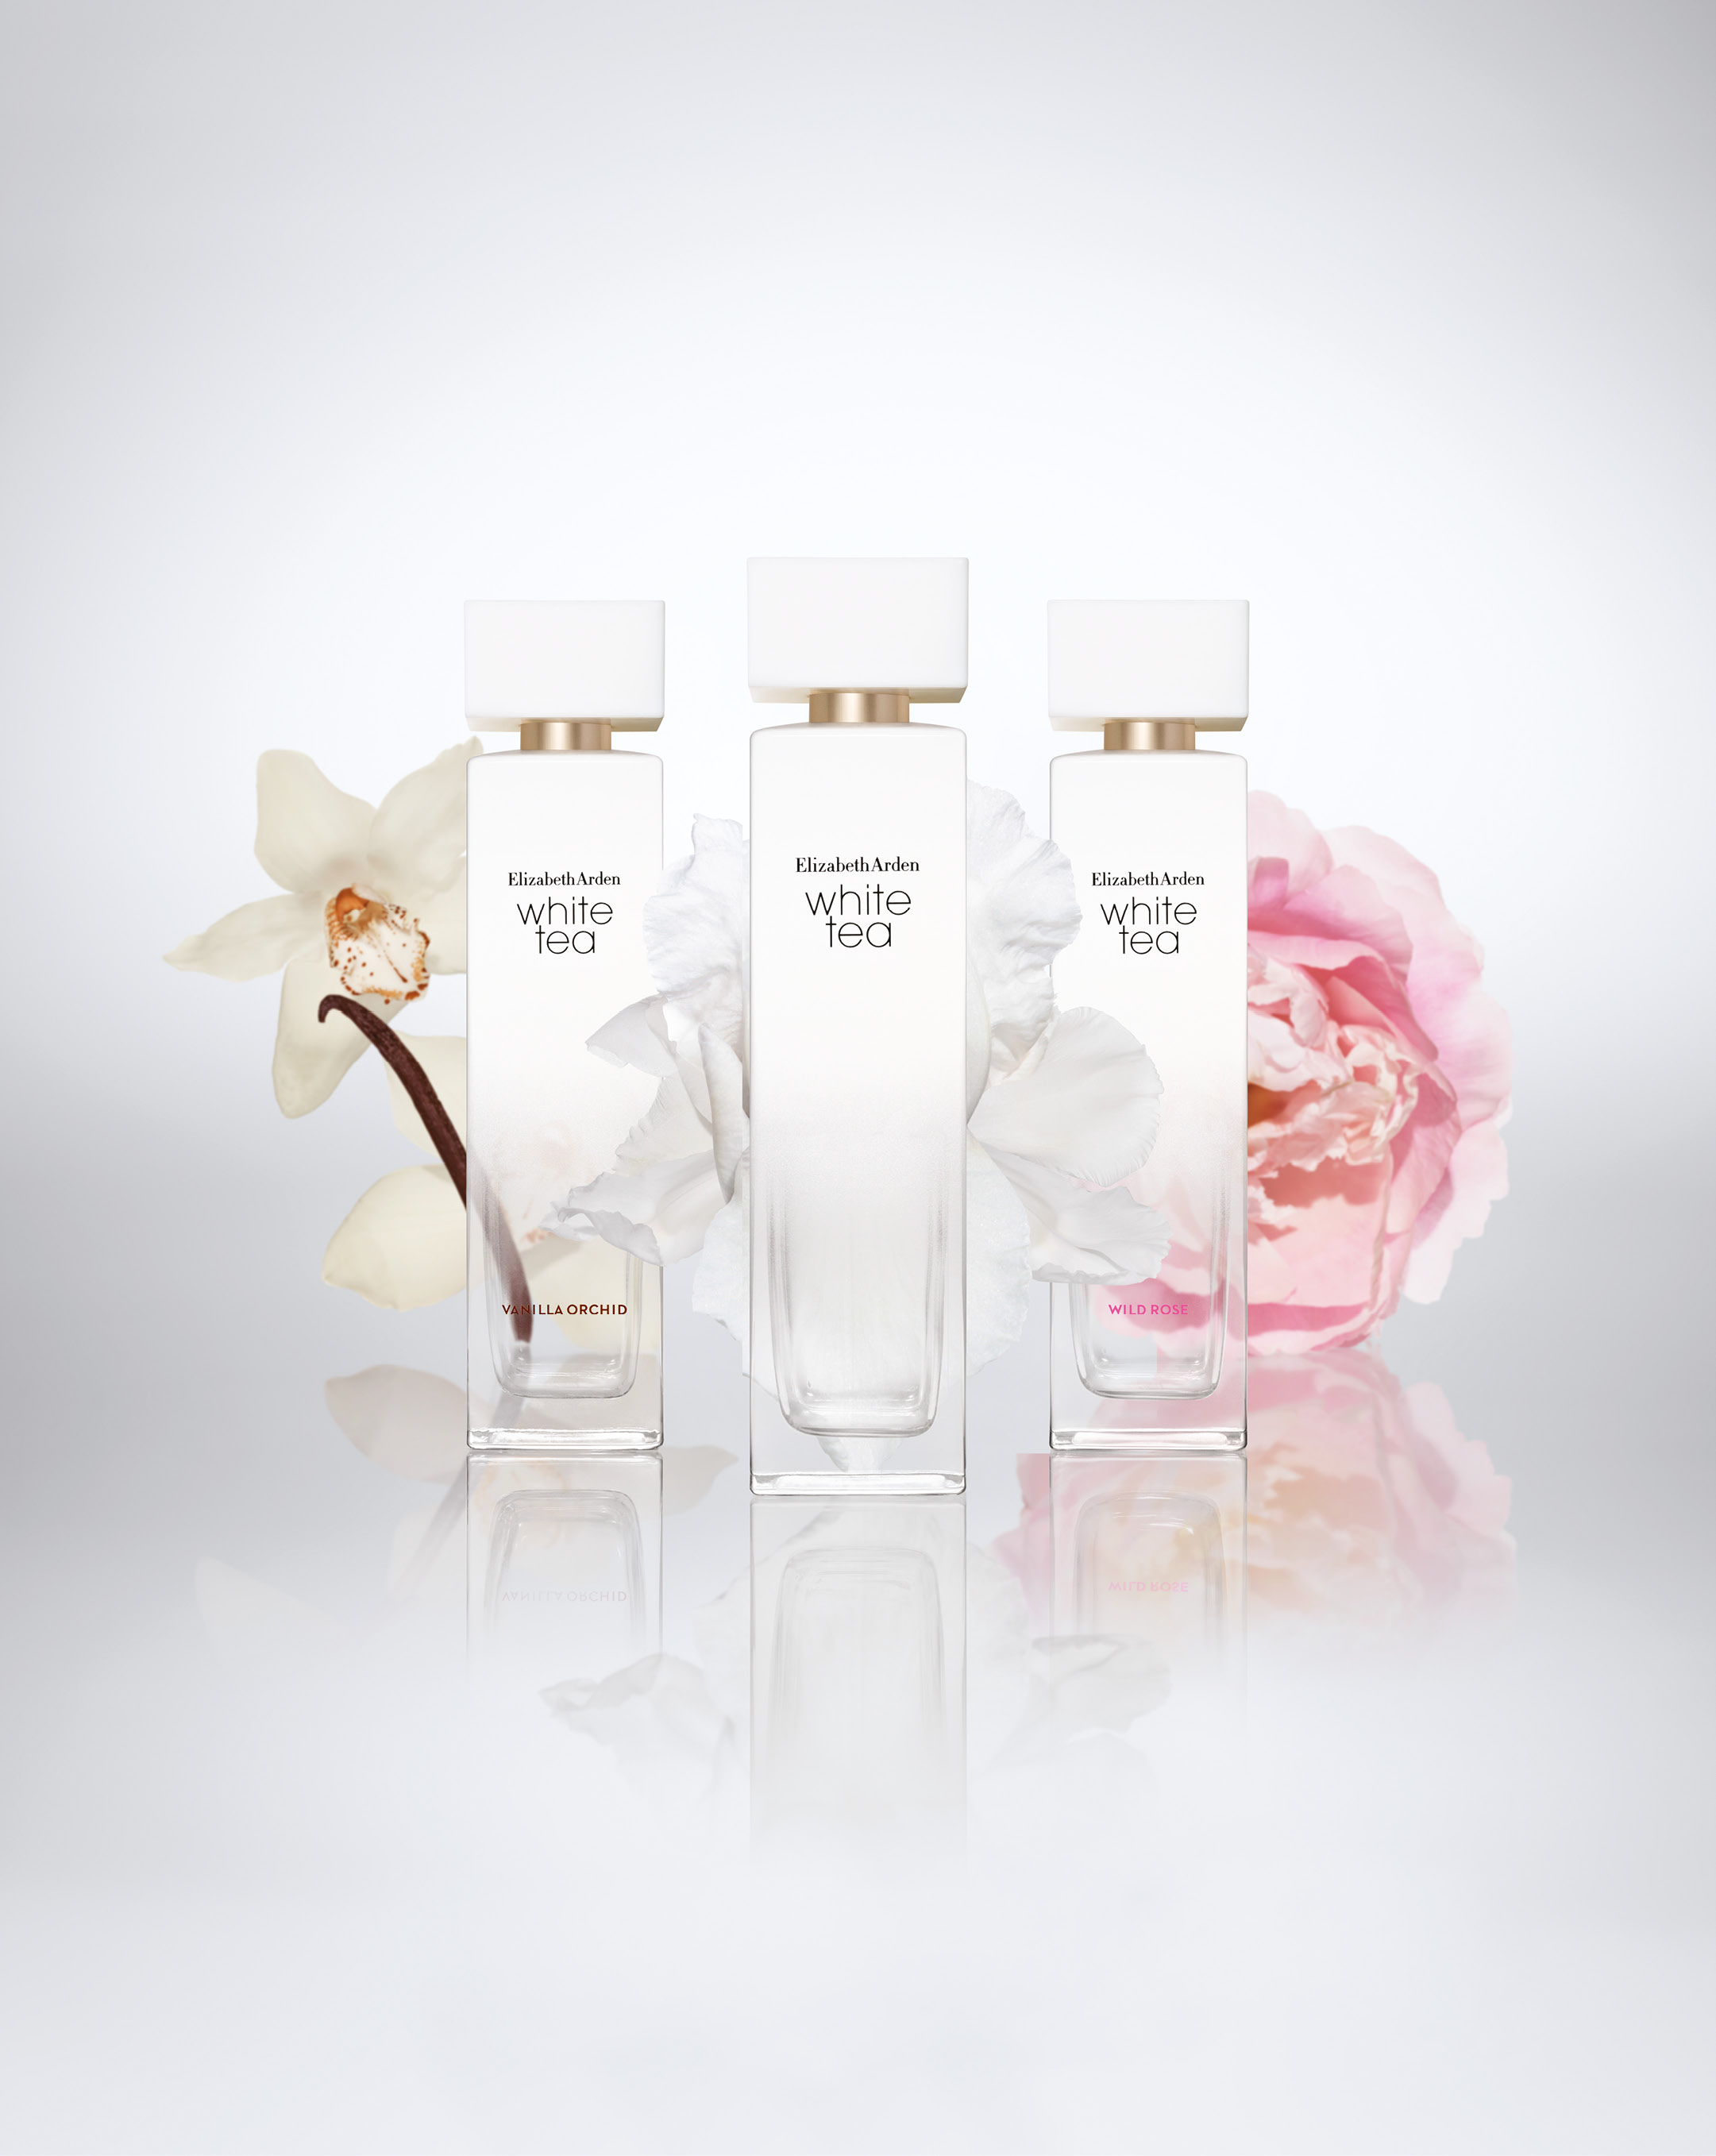 Elizabeth Arden, White Tea, parfumer, Reese Witherspoon, konkurrence